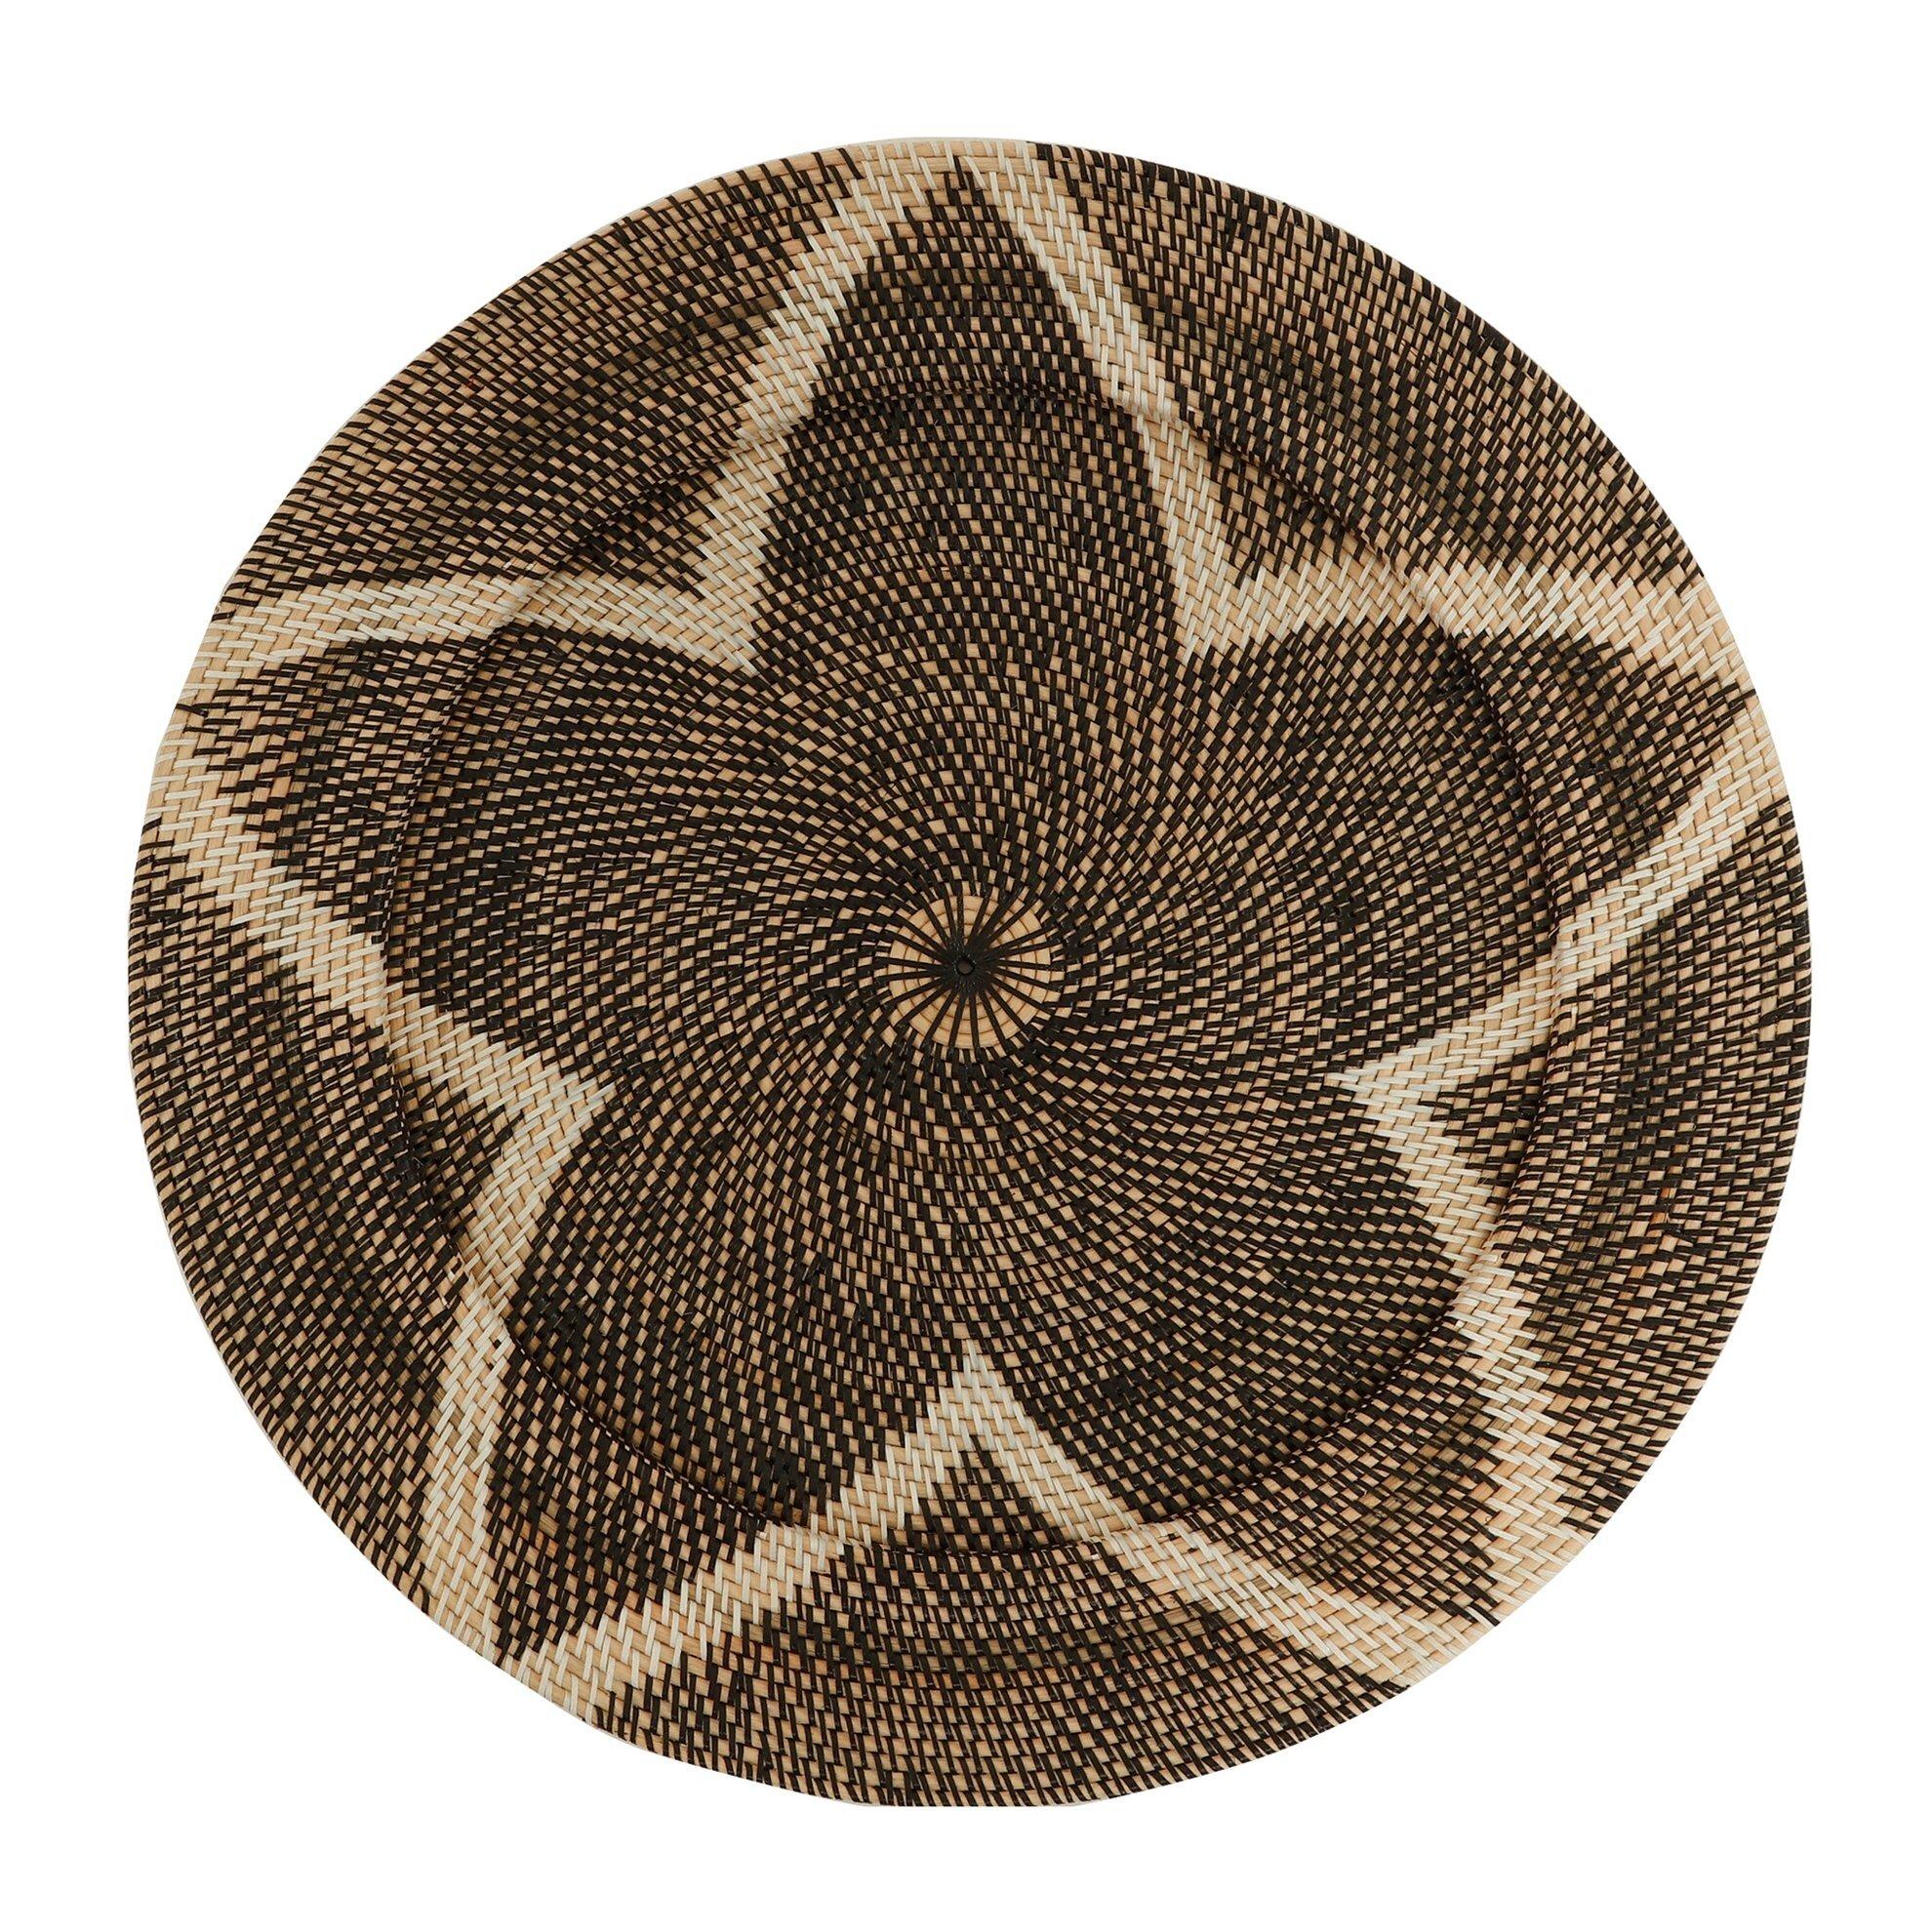 Duvar Dekor (70x4cm)